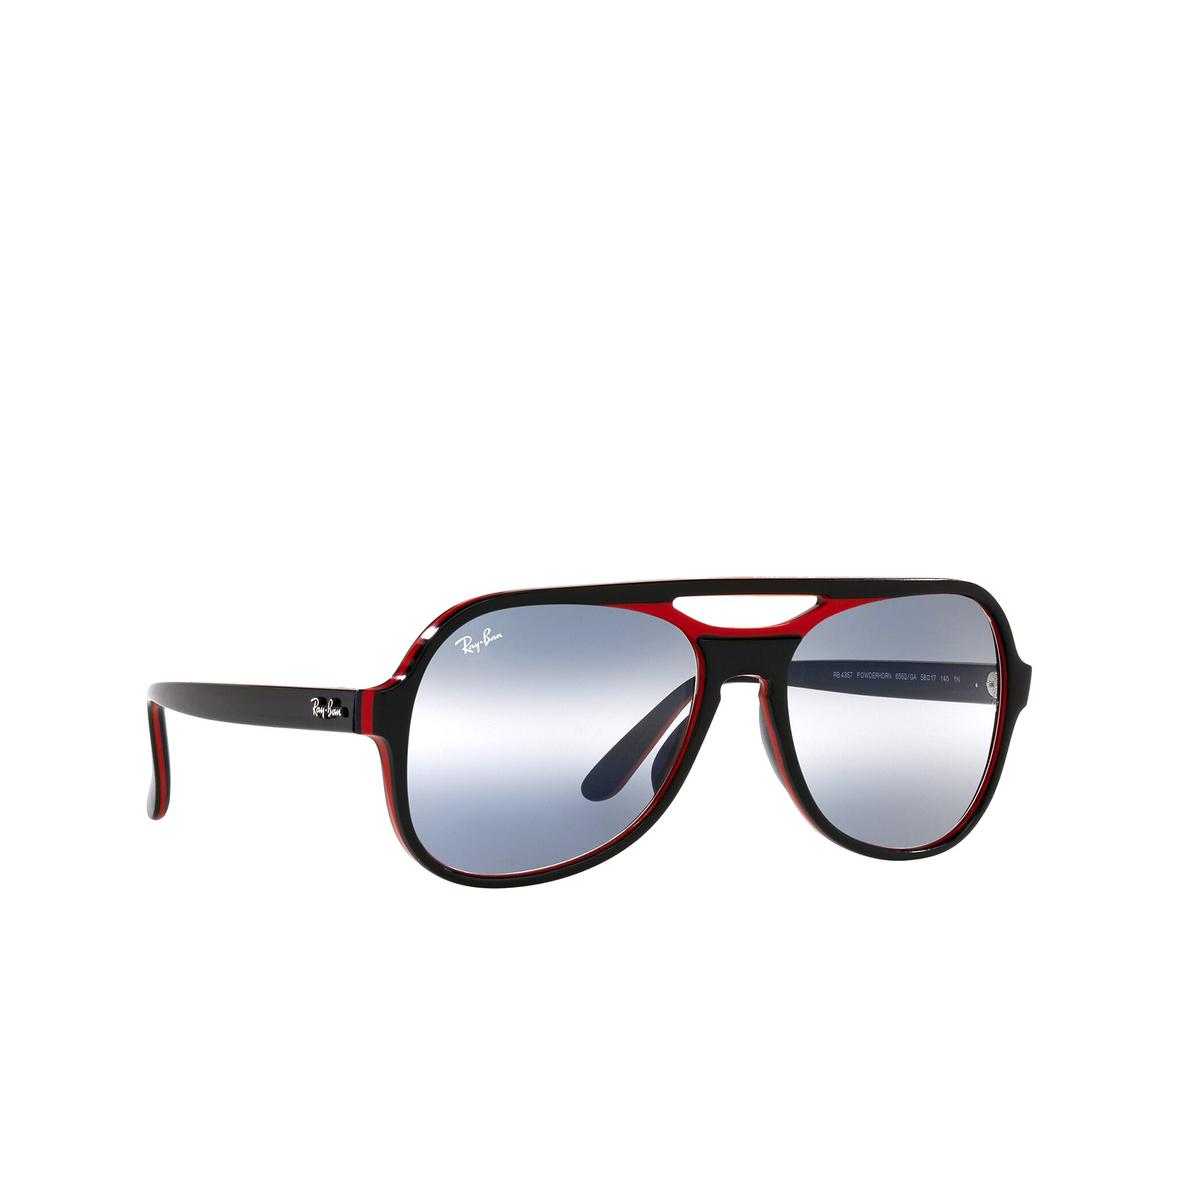 Ray-Ban® Aviator Sunglasses: Powderhorn RB4357 color Black Red Blue 6552GA - three-quarters view.